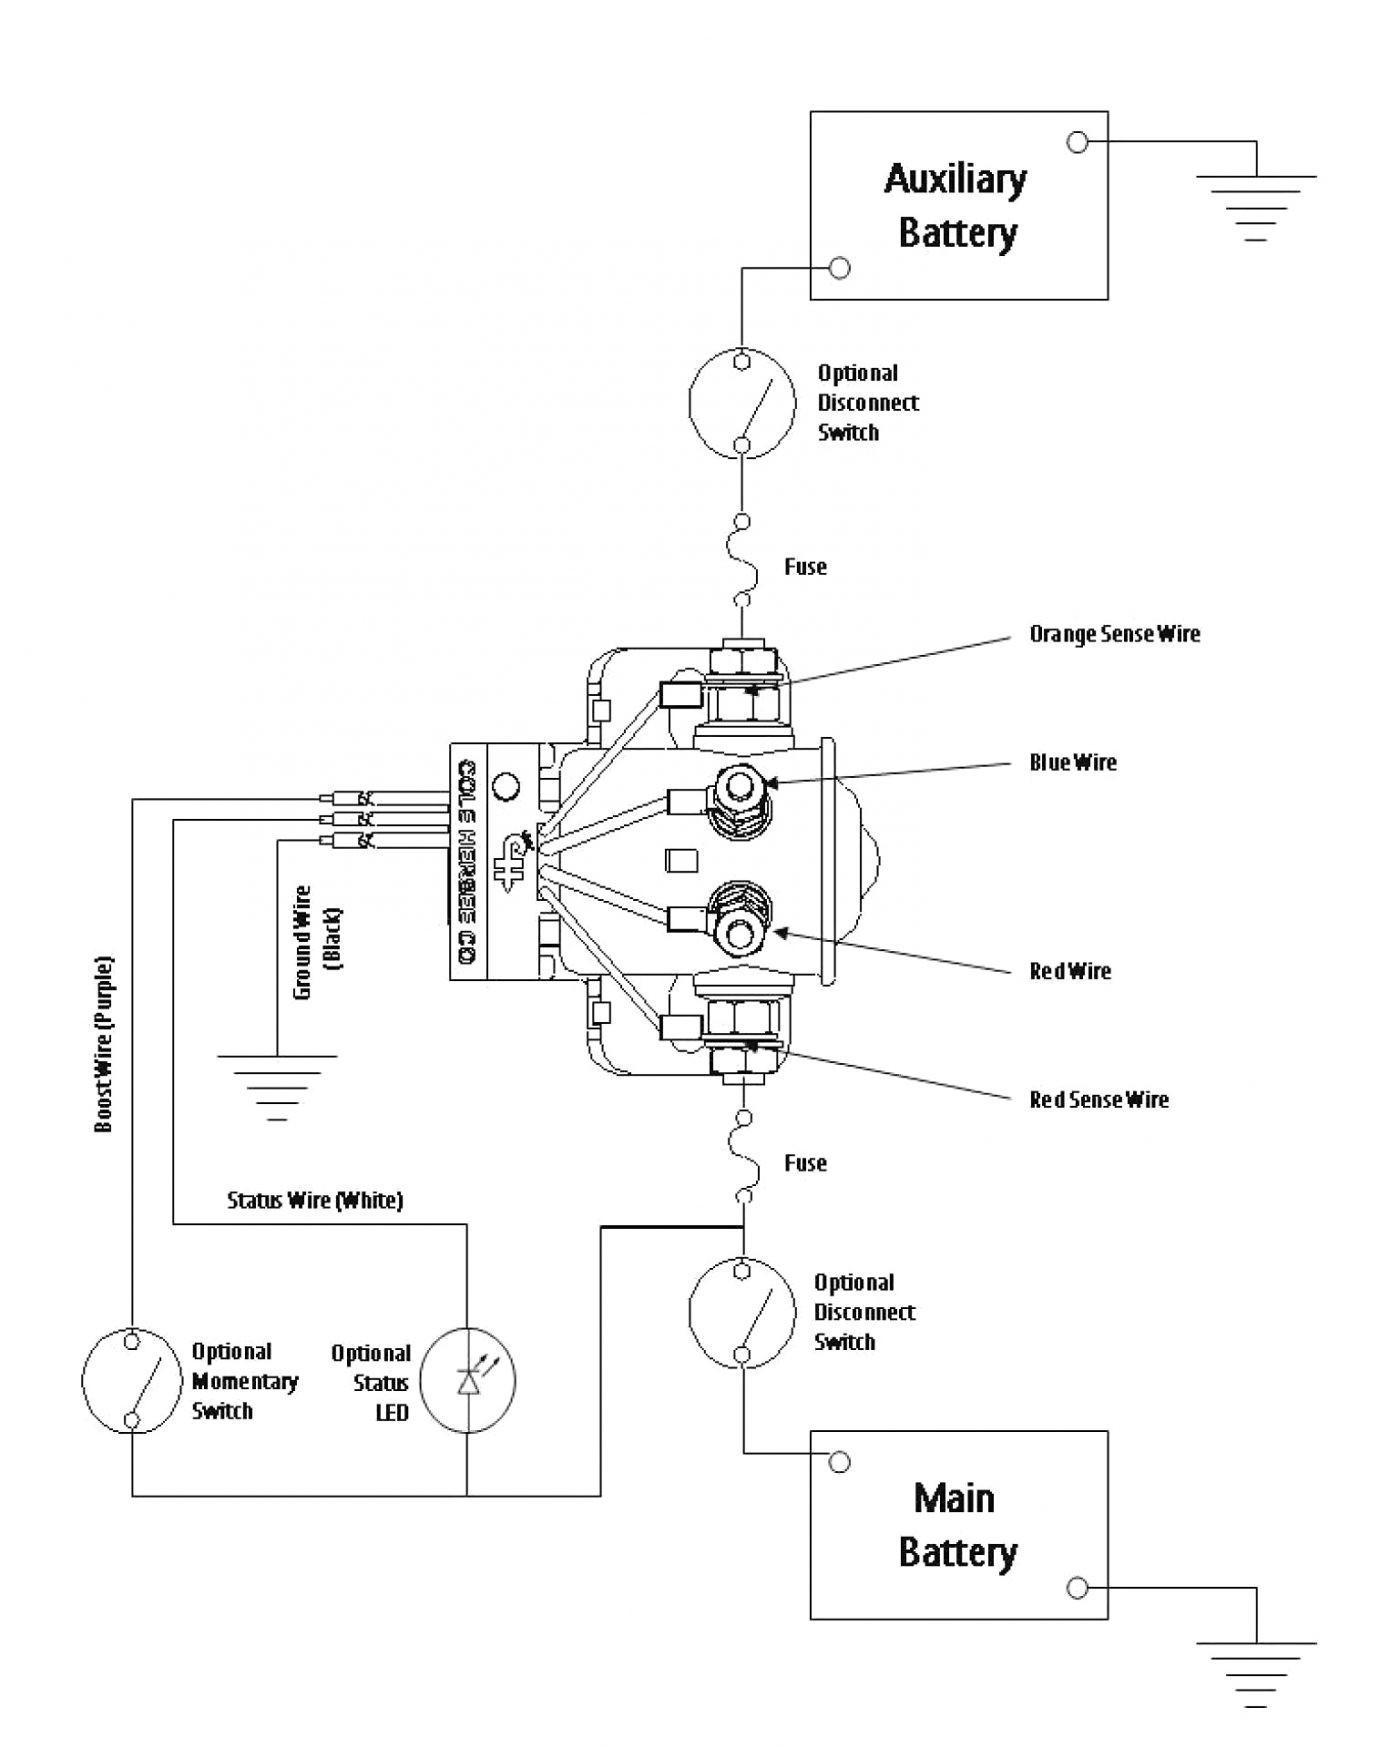 Diagram Bmw E36 M50 Wiring Diagram Full Version Hd Quality Wiring Diagram Diagramsfae Caditwergi It